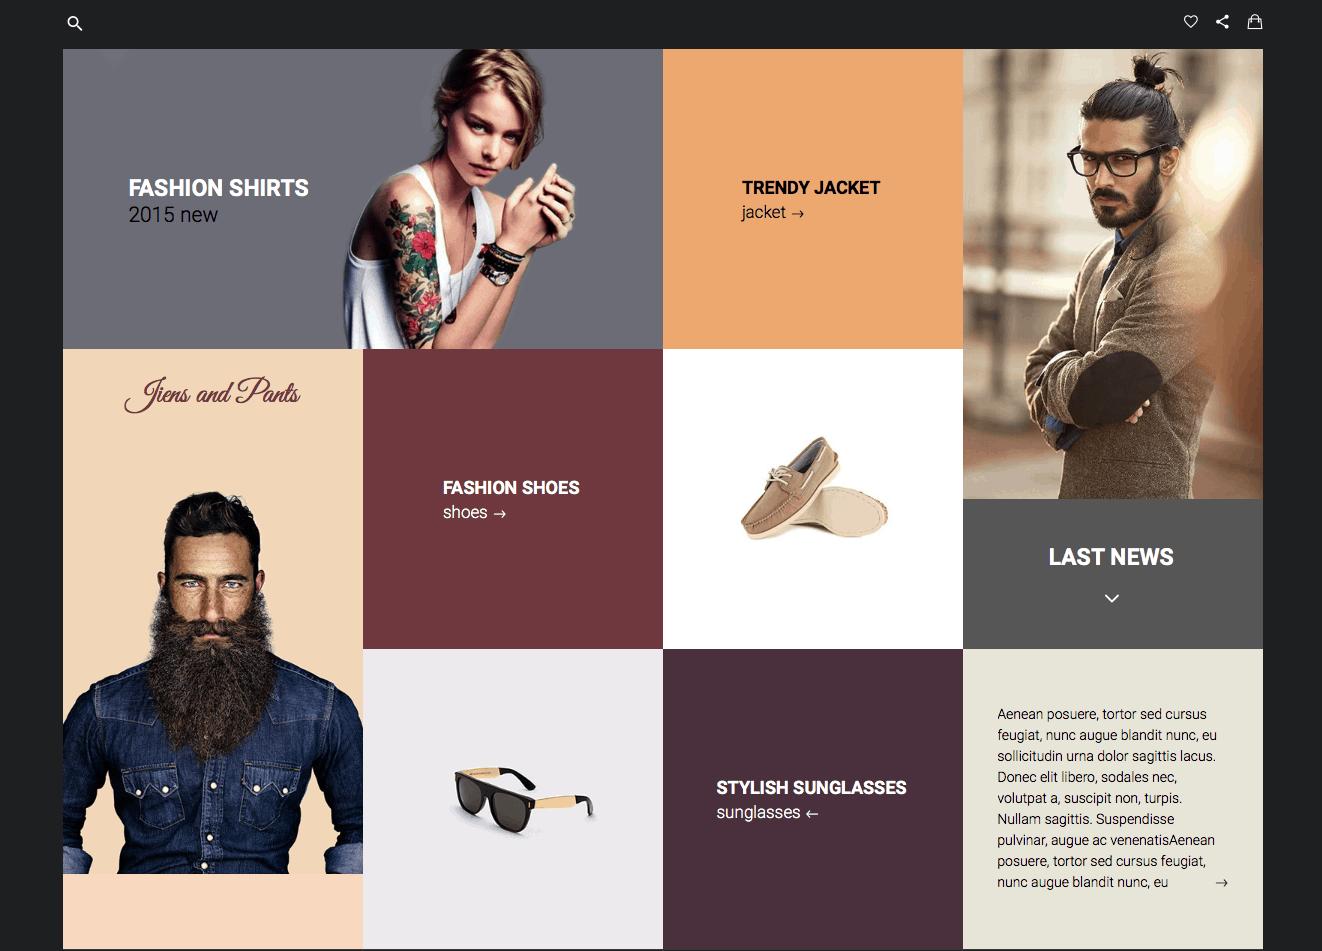 Apparel shop Desktop